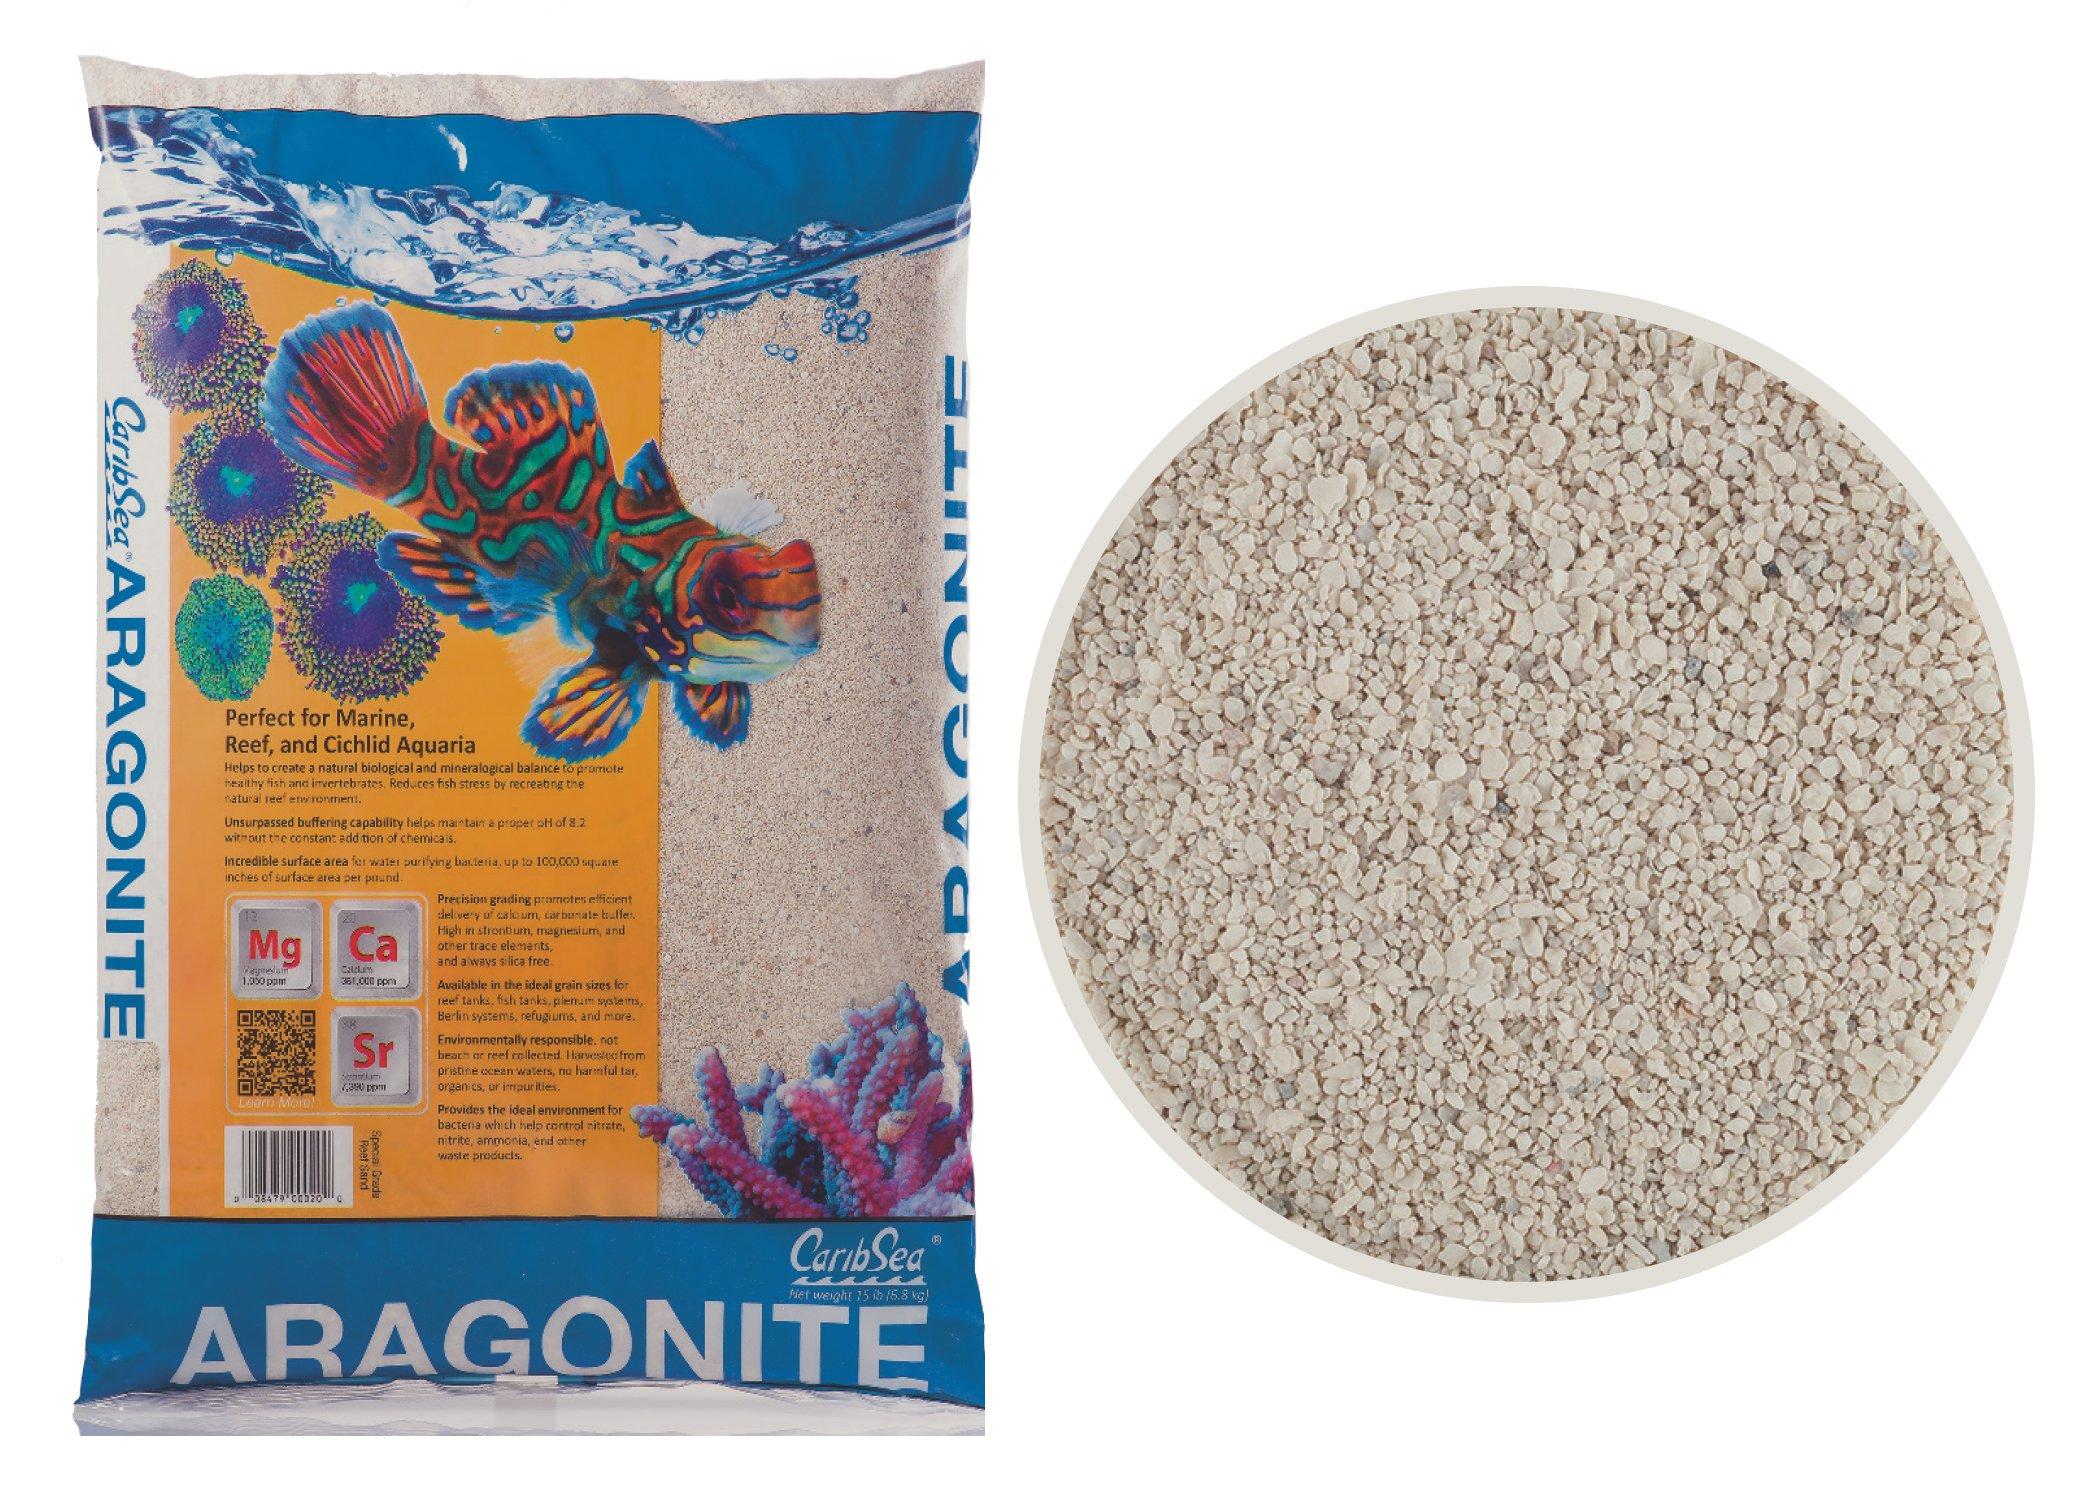 Carib Sea ACS00932 Aragamax Select Sand for Aquarium, 30-Pound by Carib Sea